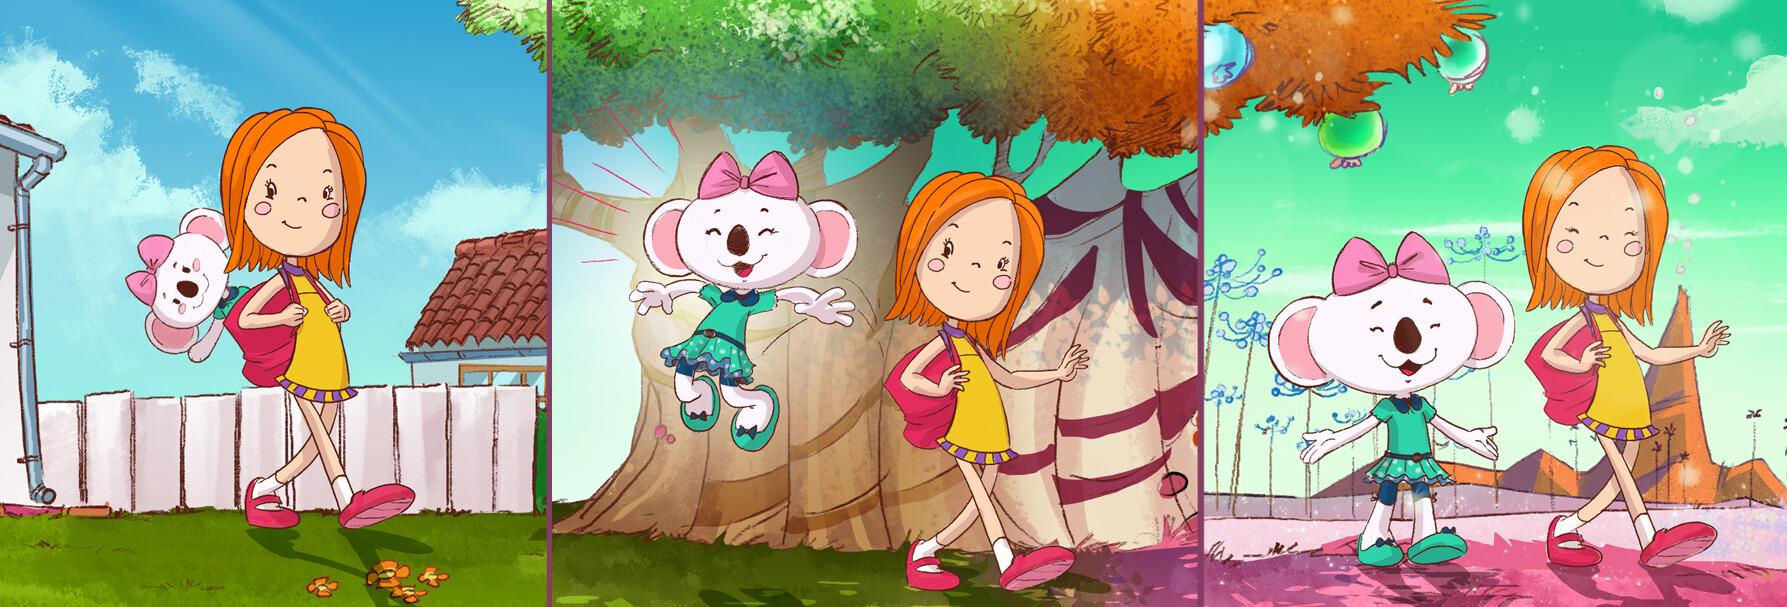 mundo-ripilica-animacao-serie-3d-discoverykids-marisol-mono-animation-03